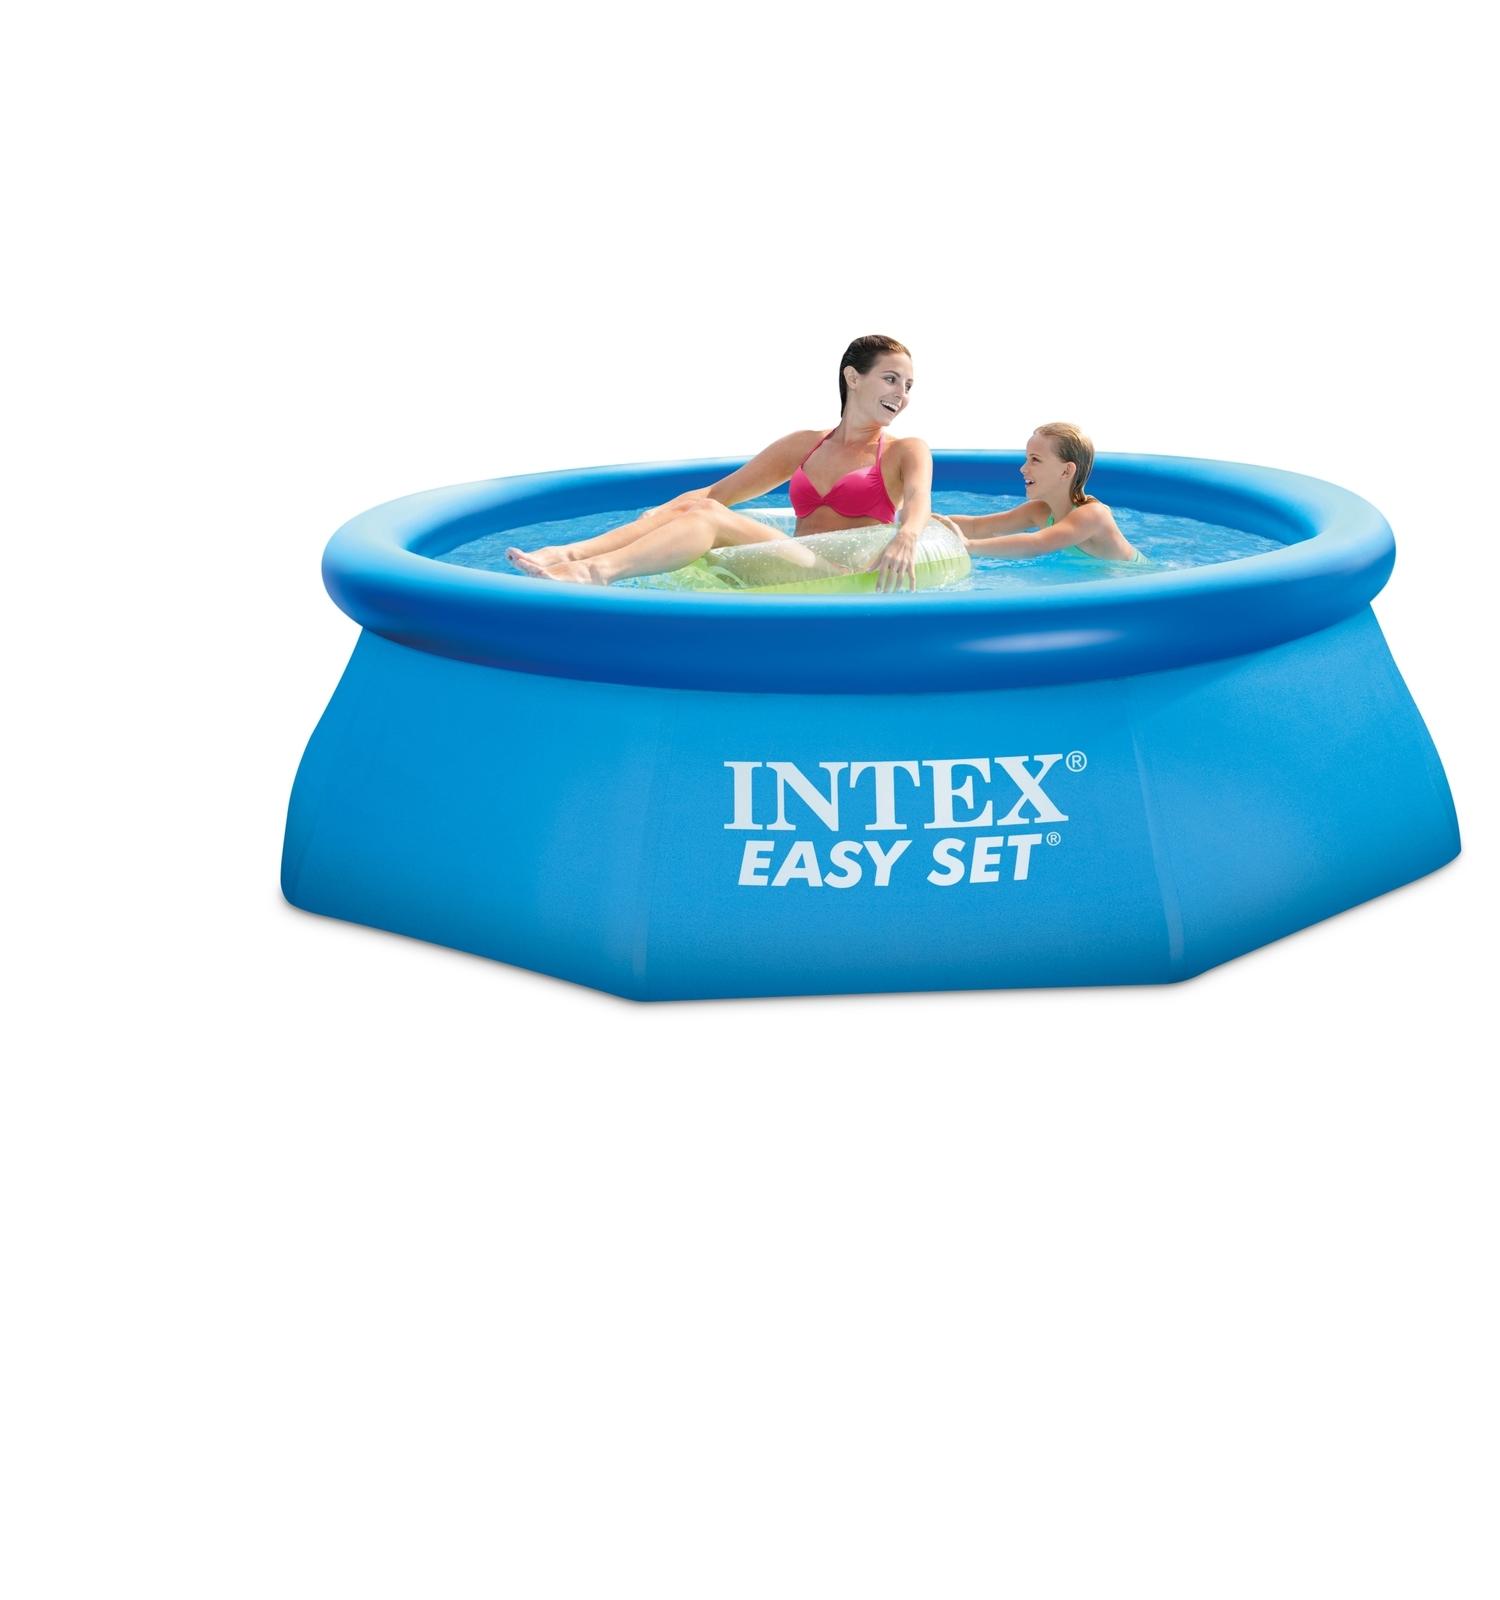 intex easy set pool 366x91 cm ohne pumpe neu ebay. Black Bedroom Furniture Sets. Home Design Ideas